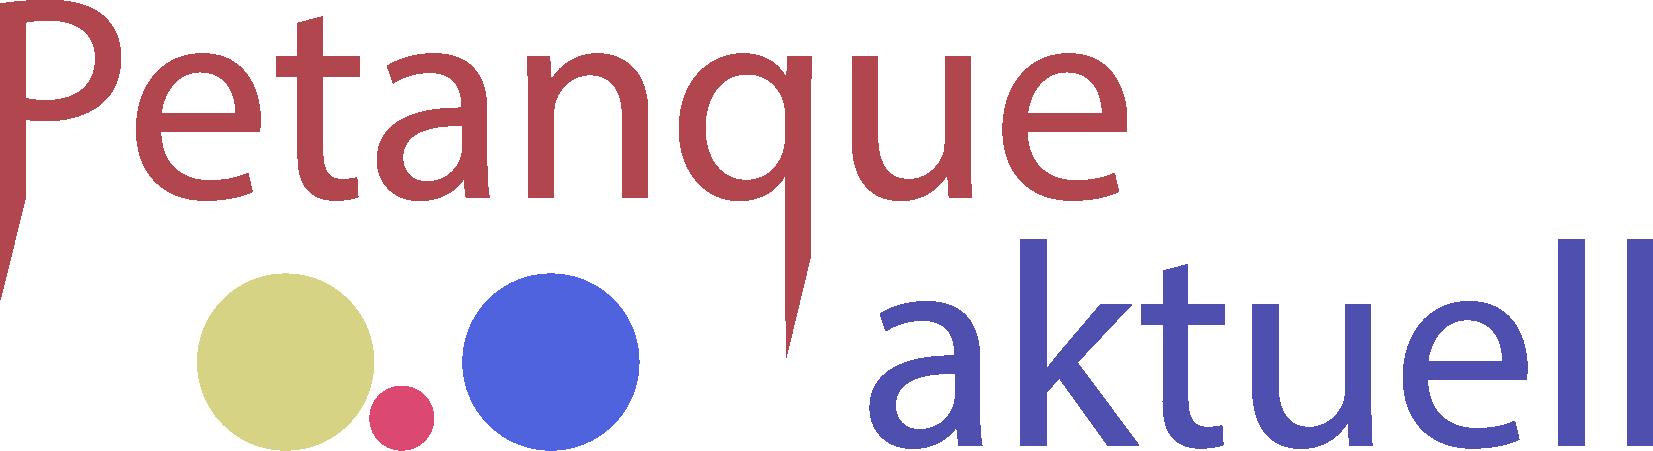 Petanque aktuell Logo